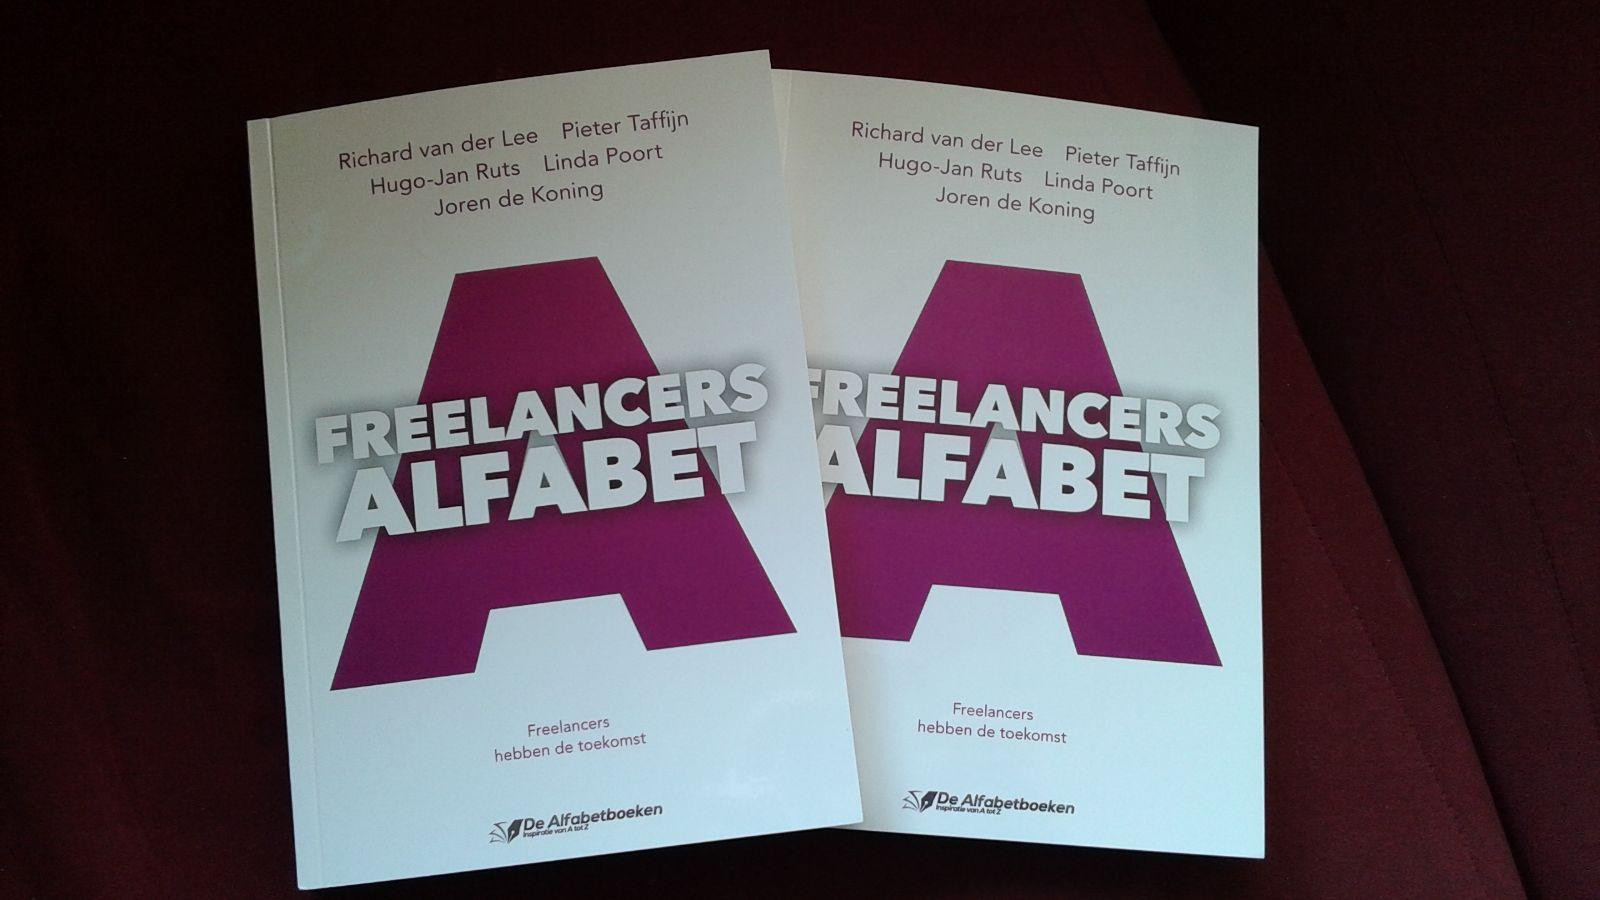 Freelancers alfabet